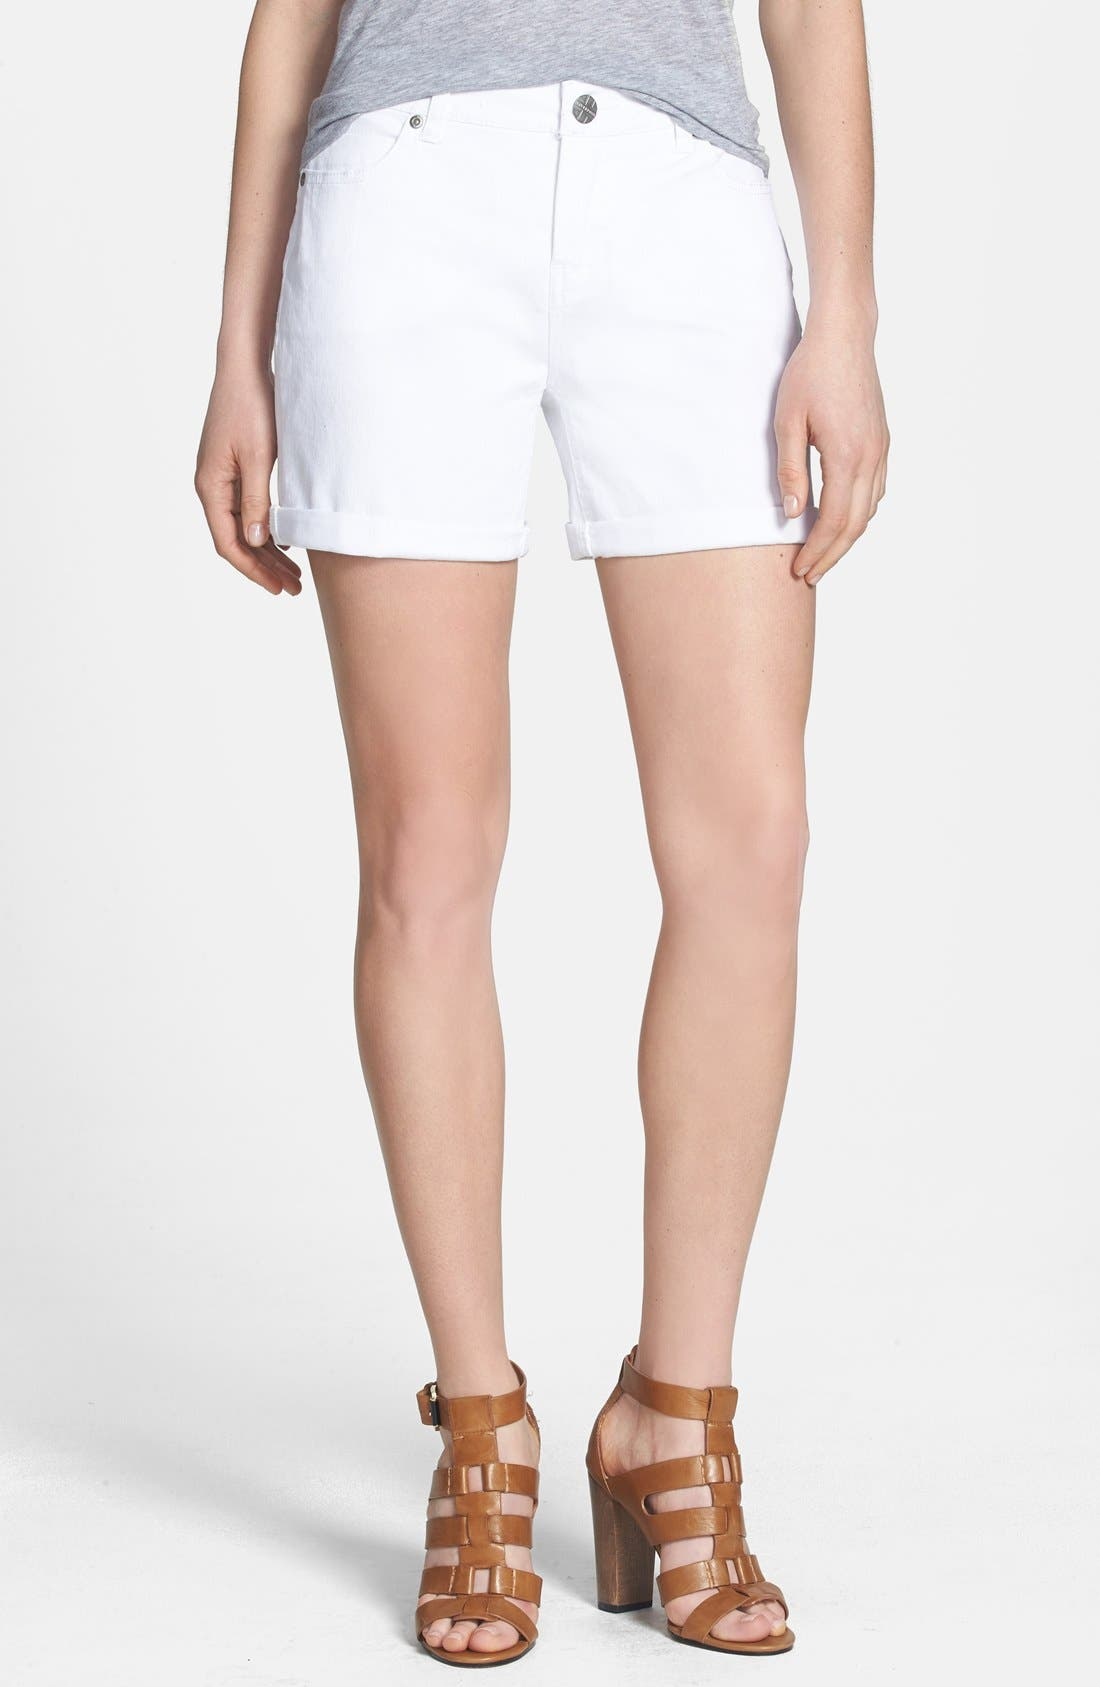 Alternate Image 1 Selected - Liverpool Jeans Company 'Linda' Denim Shorts (White)